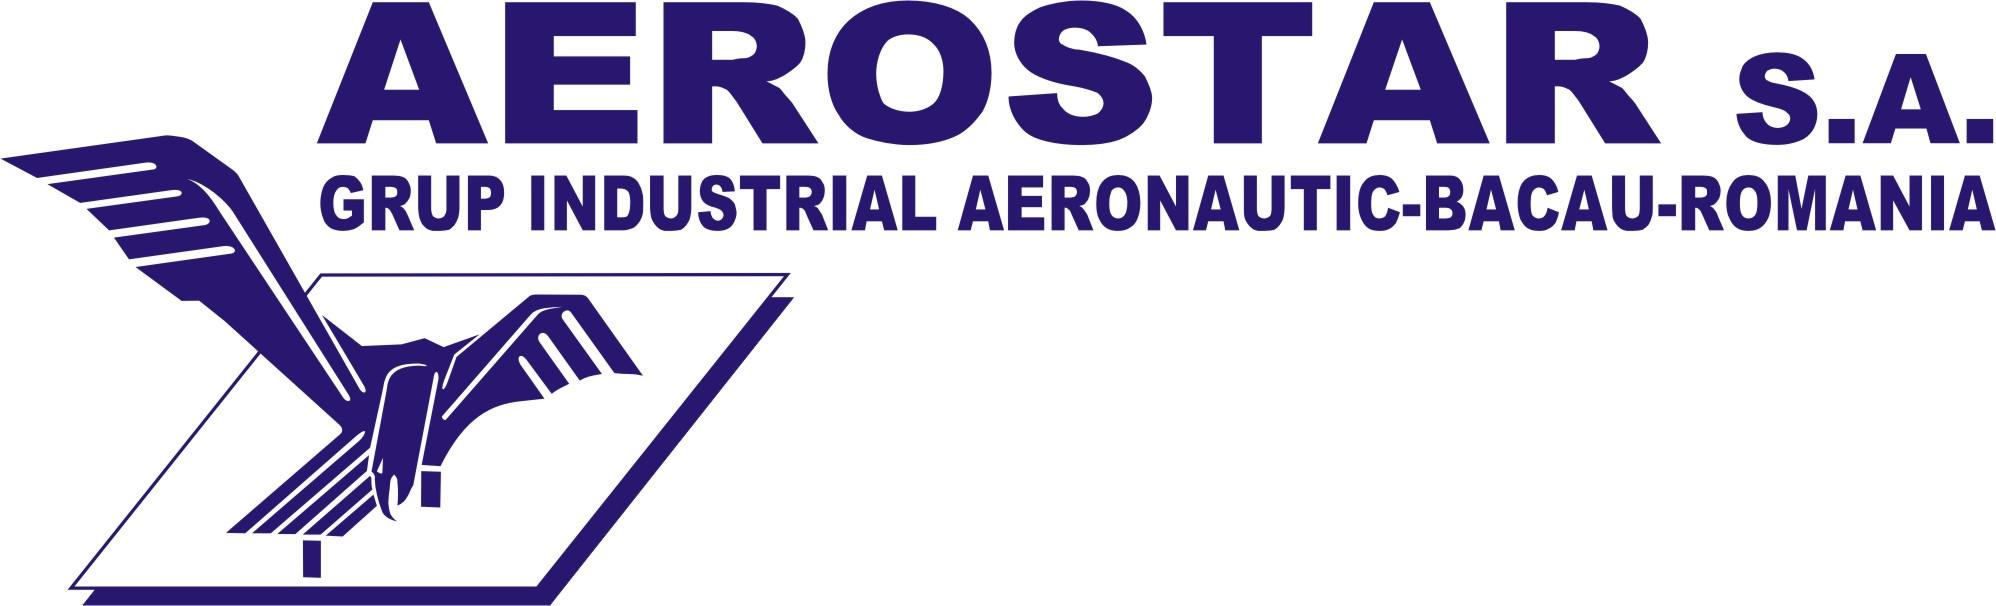 logo_Aerostar